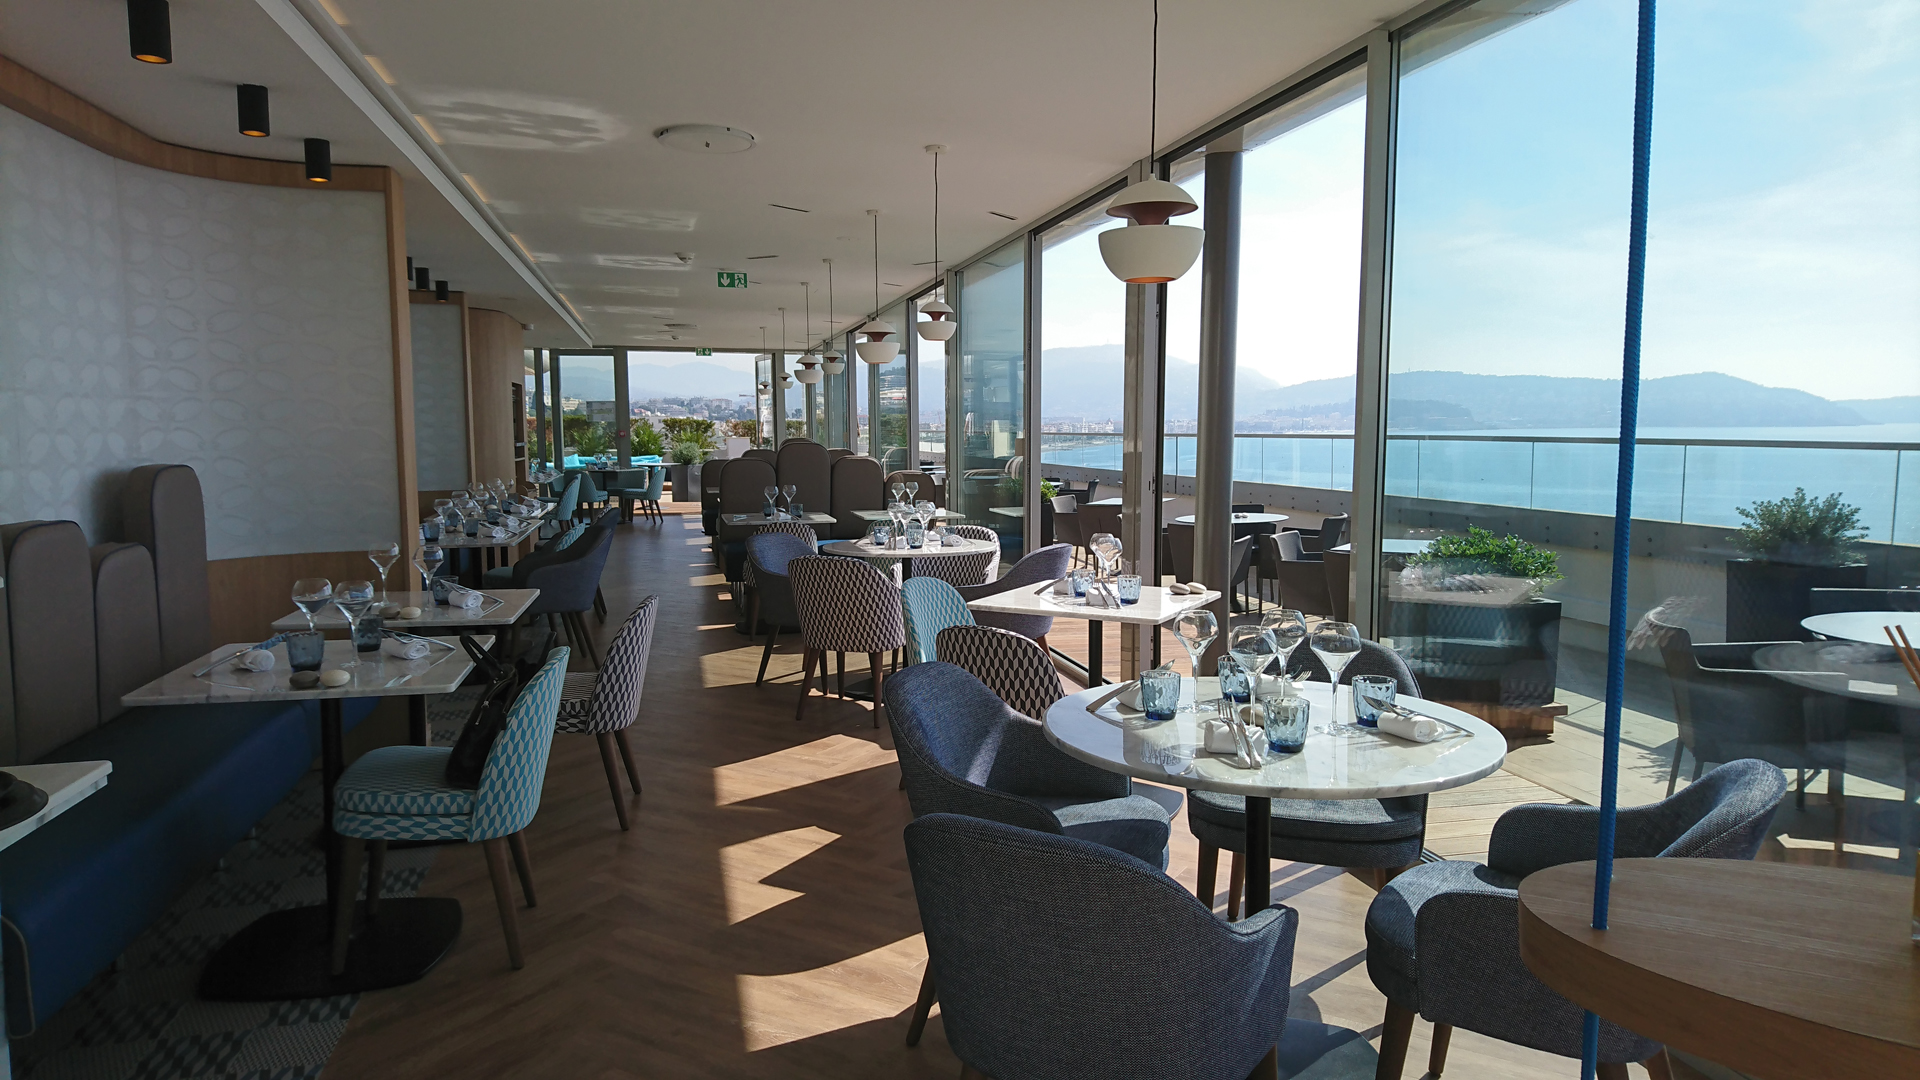 Radisson Blu Hotel Nice Fr Very Wood Italian Chair